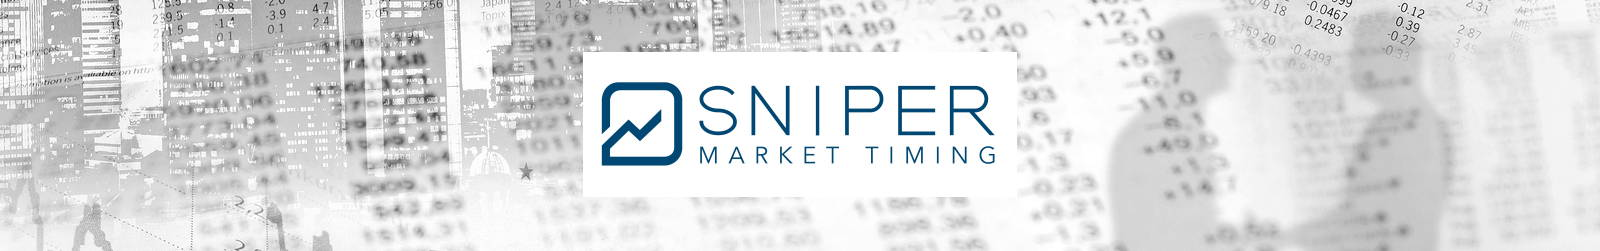 Market risk management performance